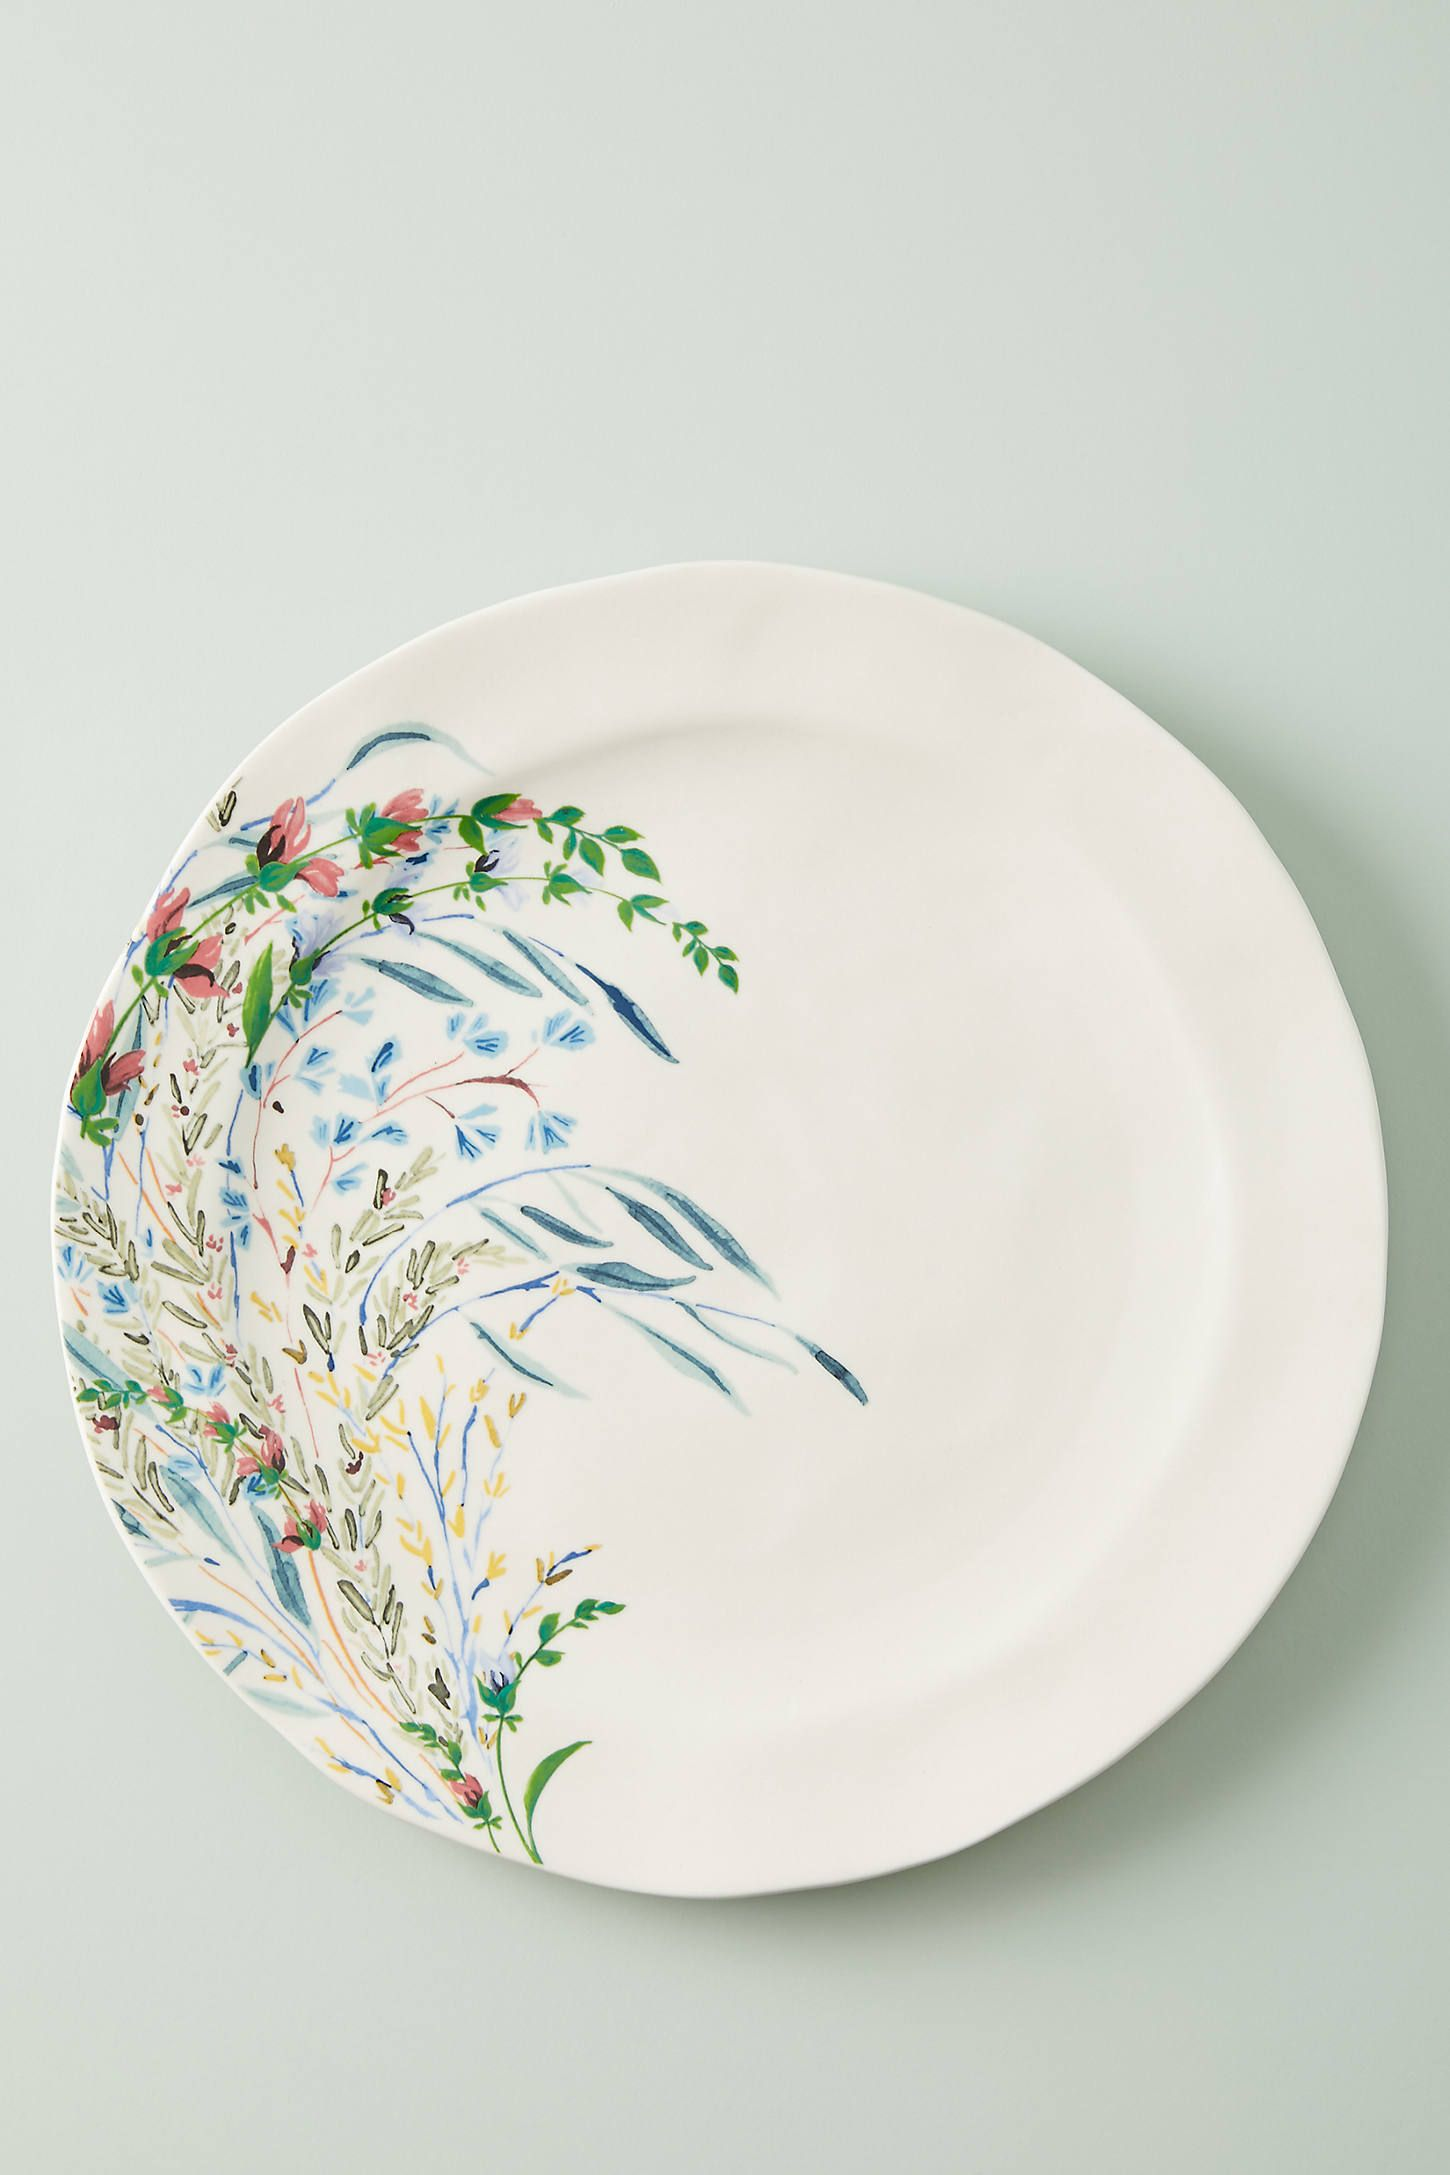 Printemps Dinner Plates, Set of 4